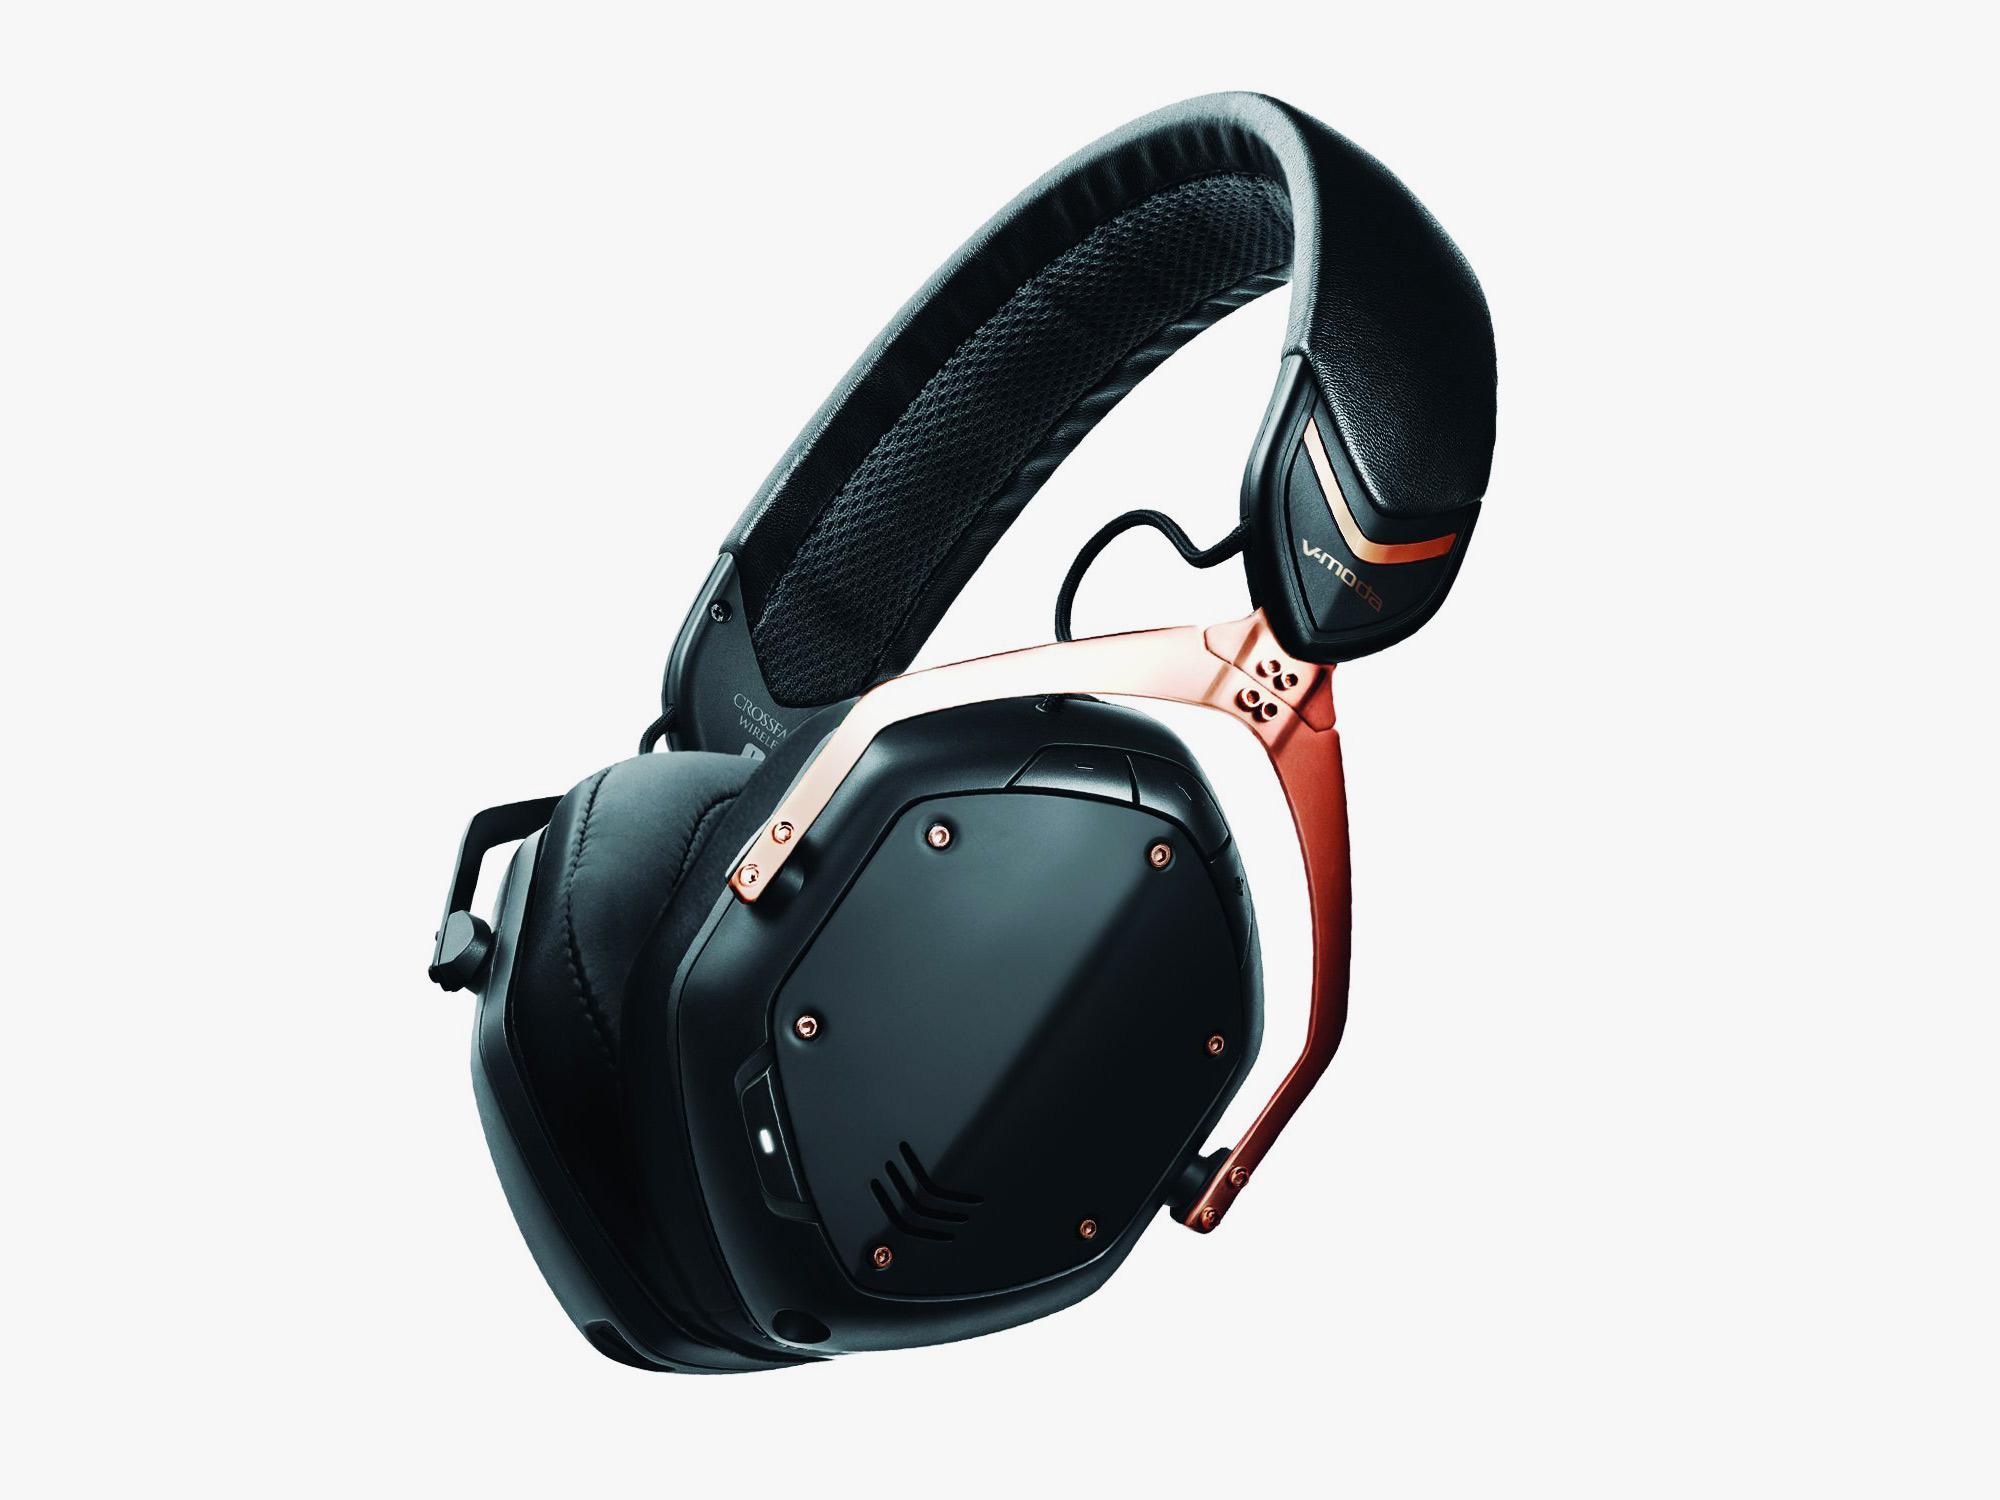 V-MODA wireless headphones